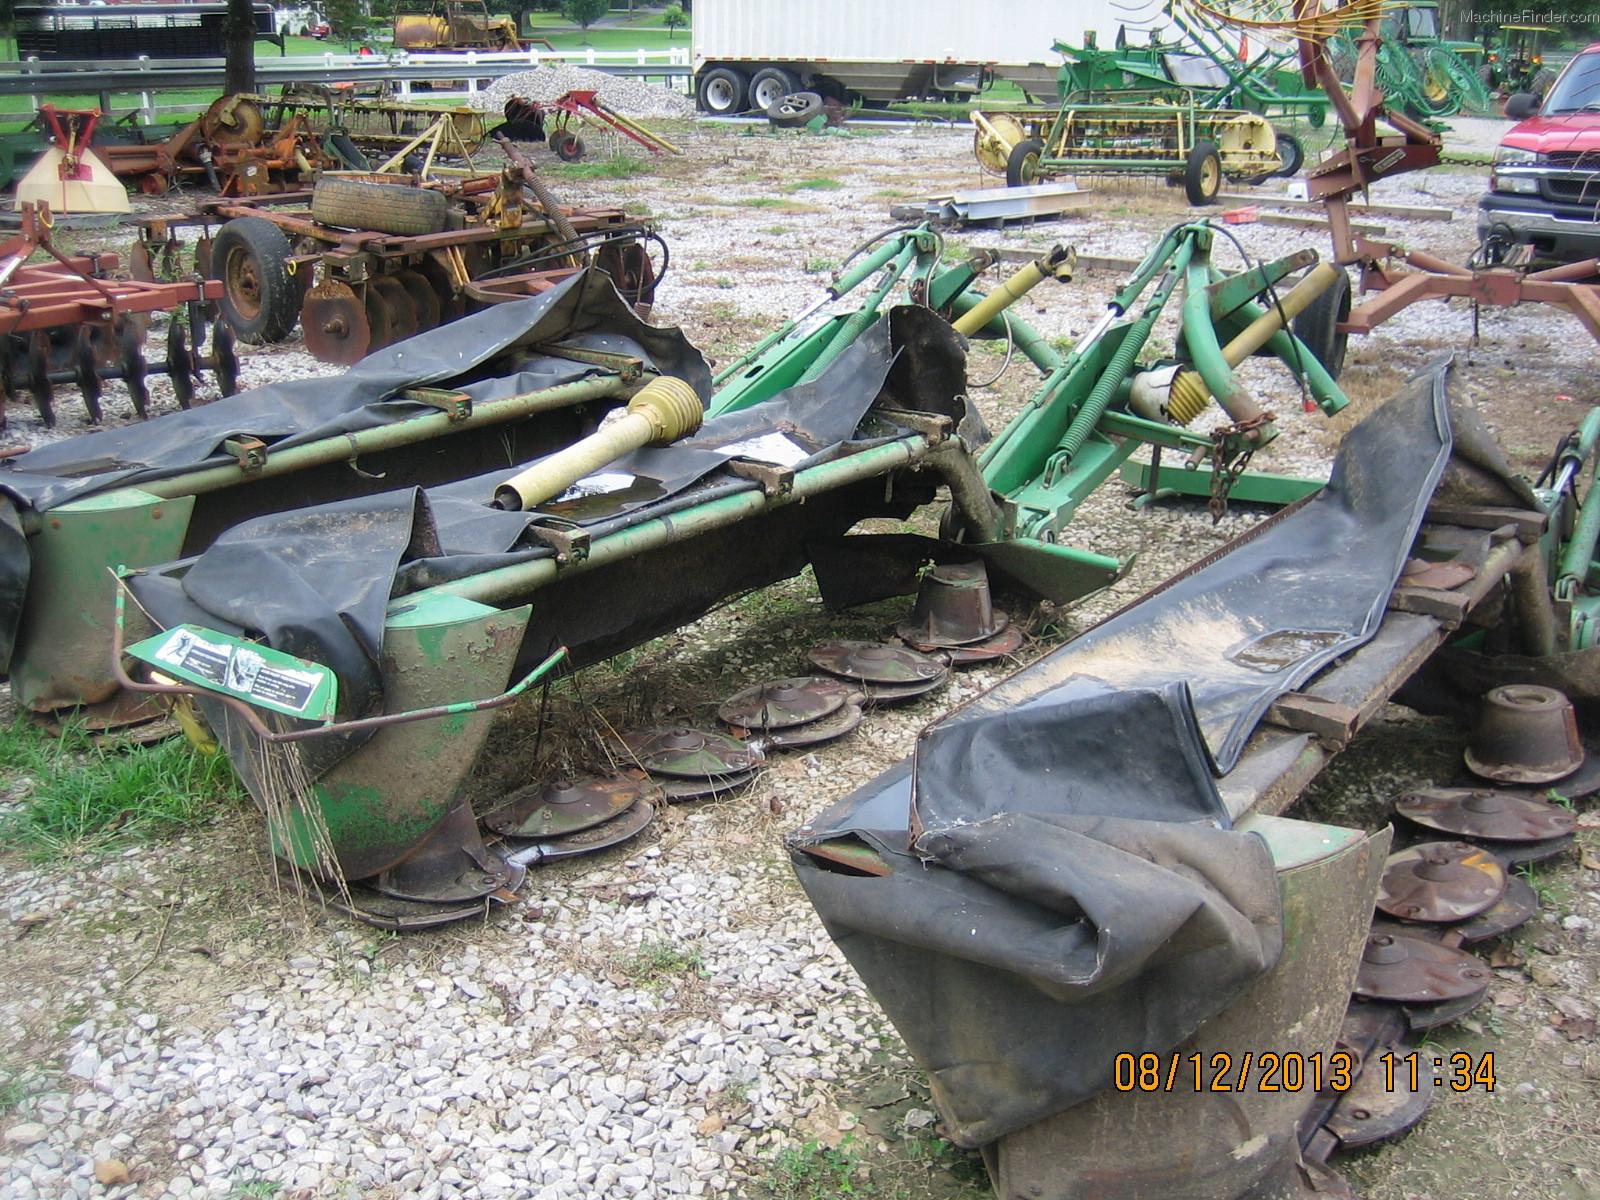 John Deere 260 Hay Equipment - Mower Conditioners & Mowers .